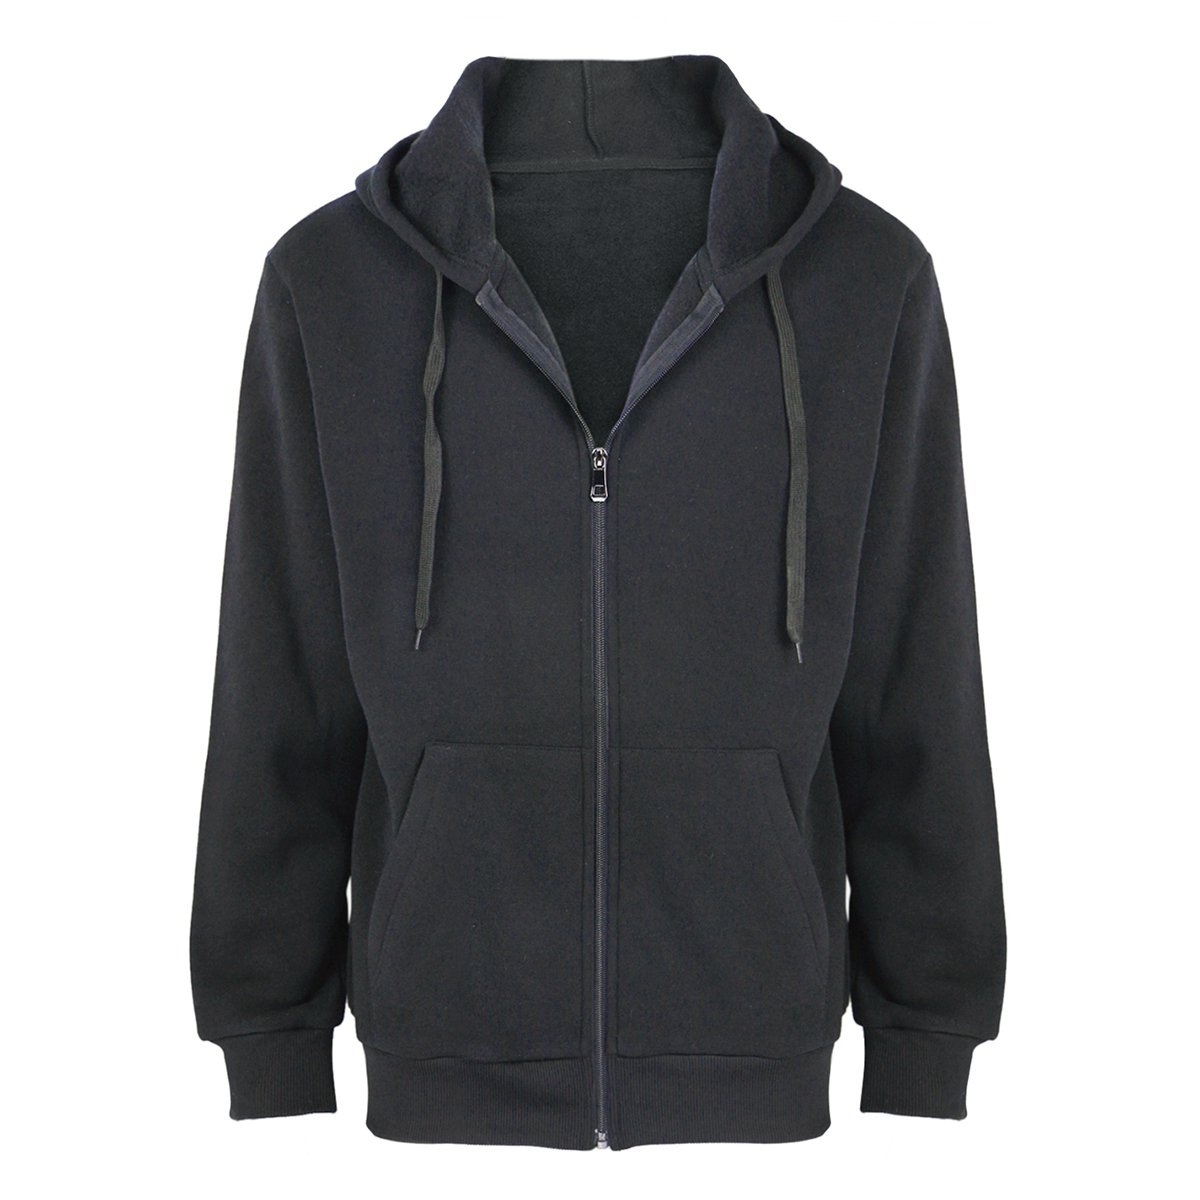 Urimoser Men's Basic Full Zip Hoodies Cotton Fleece Long Sleeve Lightweight Sweatshirts (Black, 2XL)